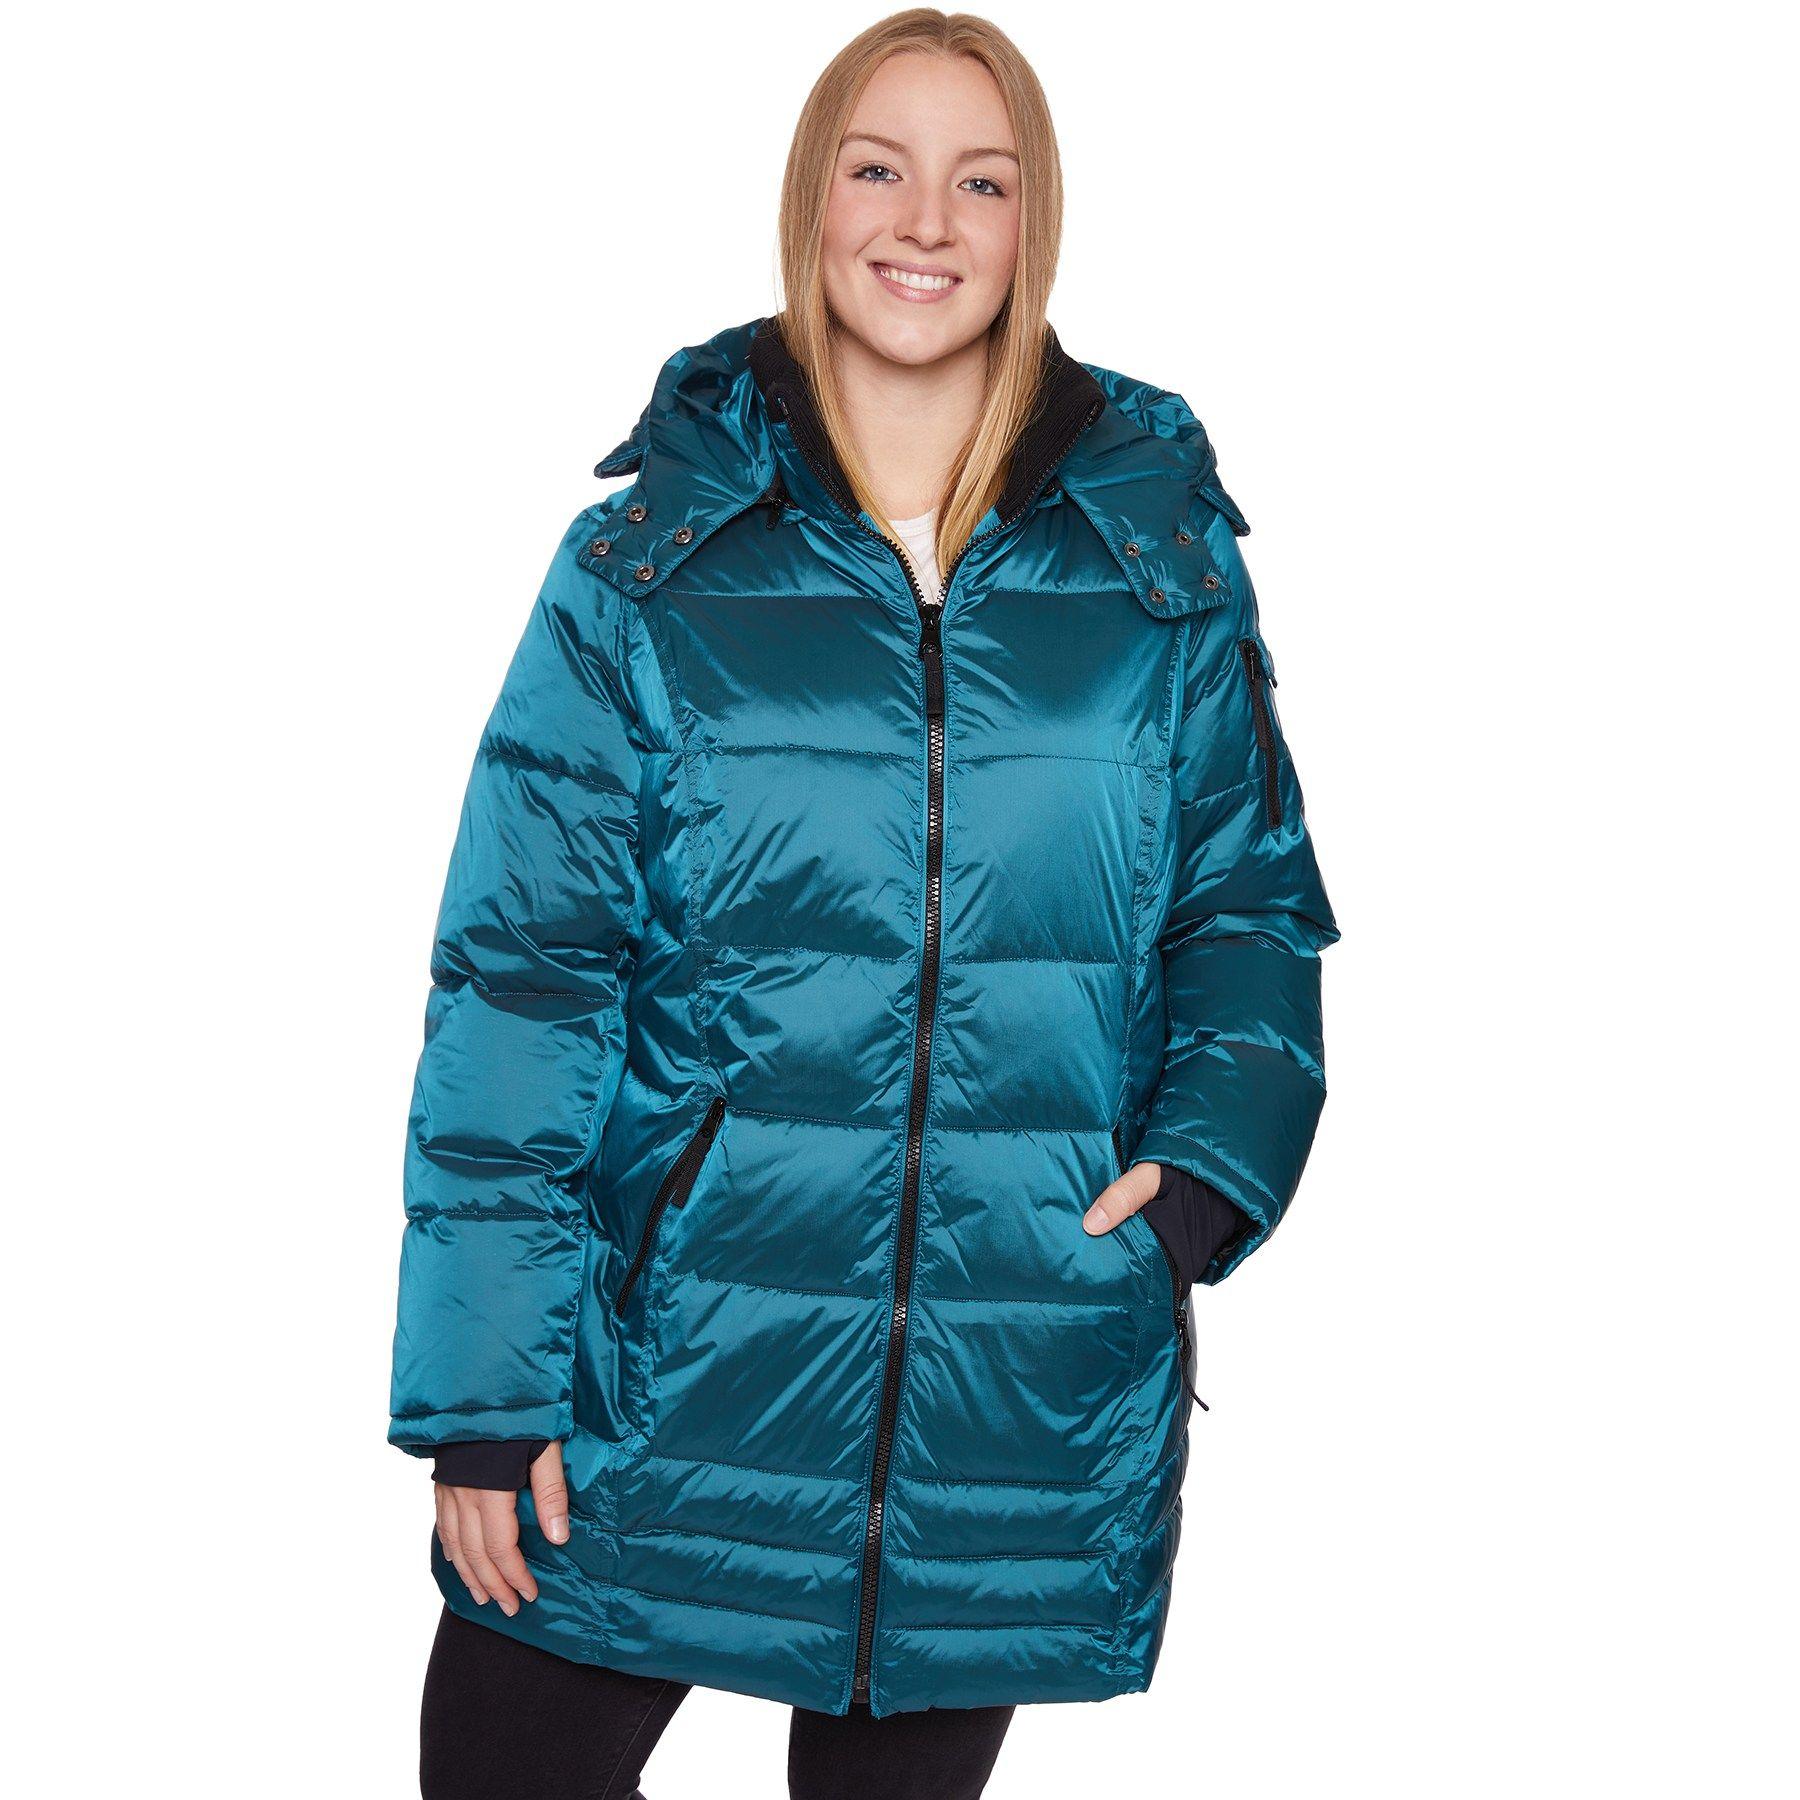 Plus Size Halitech Hooded Iridescent Puffer Jacket Hooded Halitech Size Jacket Jackets Puffer Jackets Plus Size [ 1800 x 1800 Pixel ]